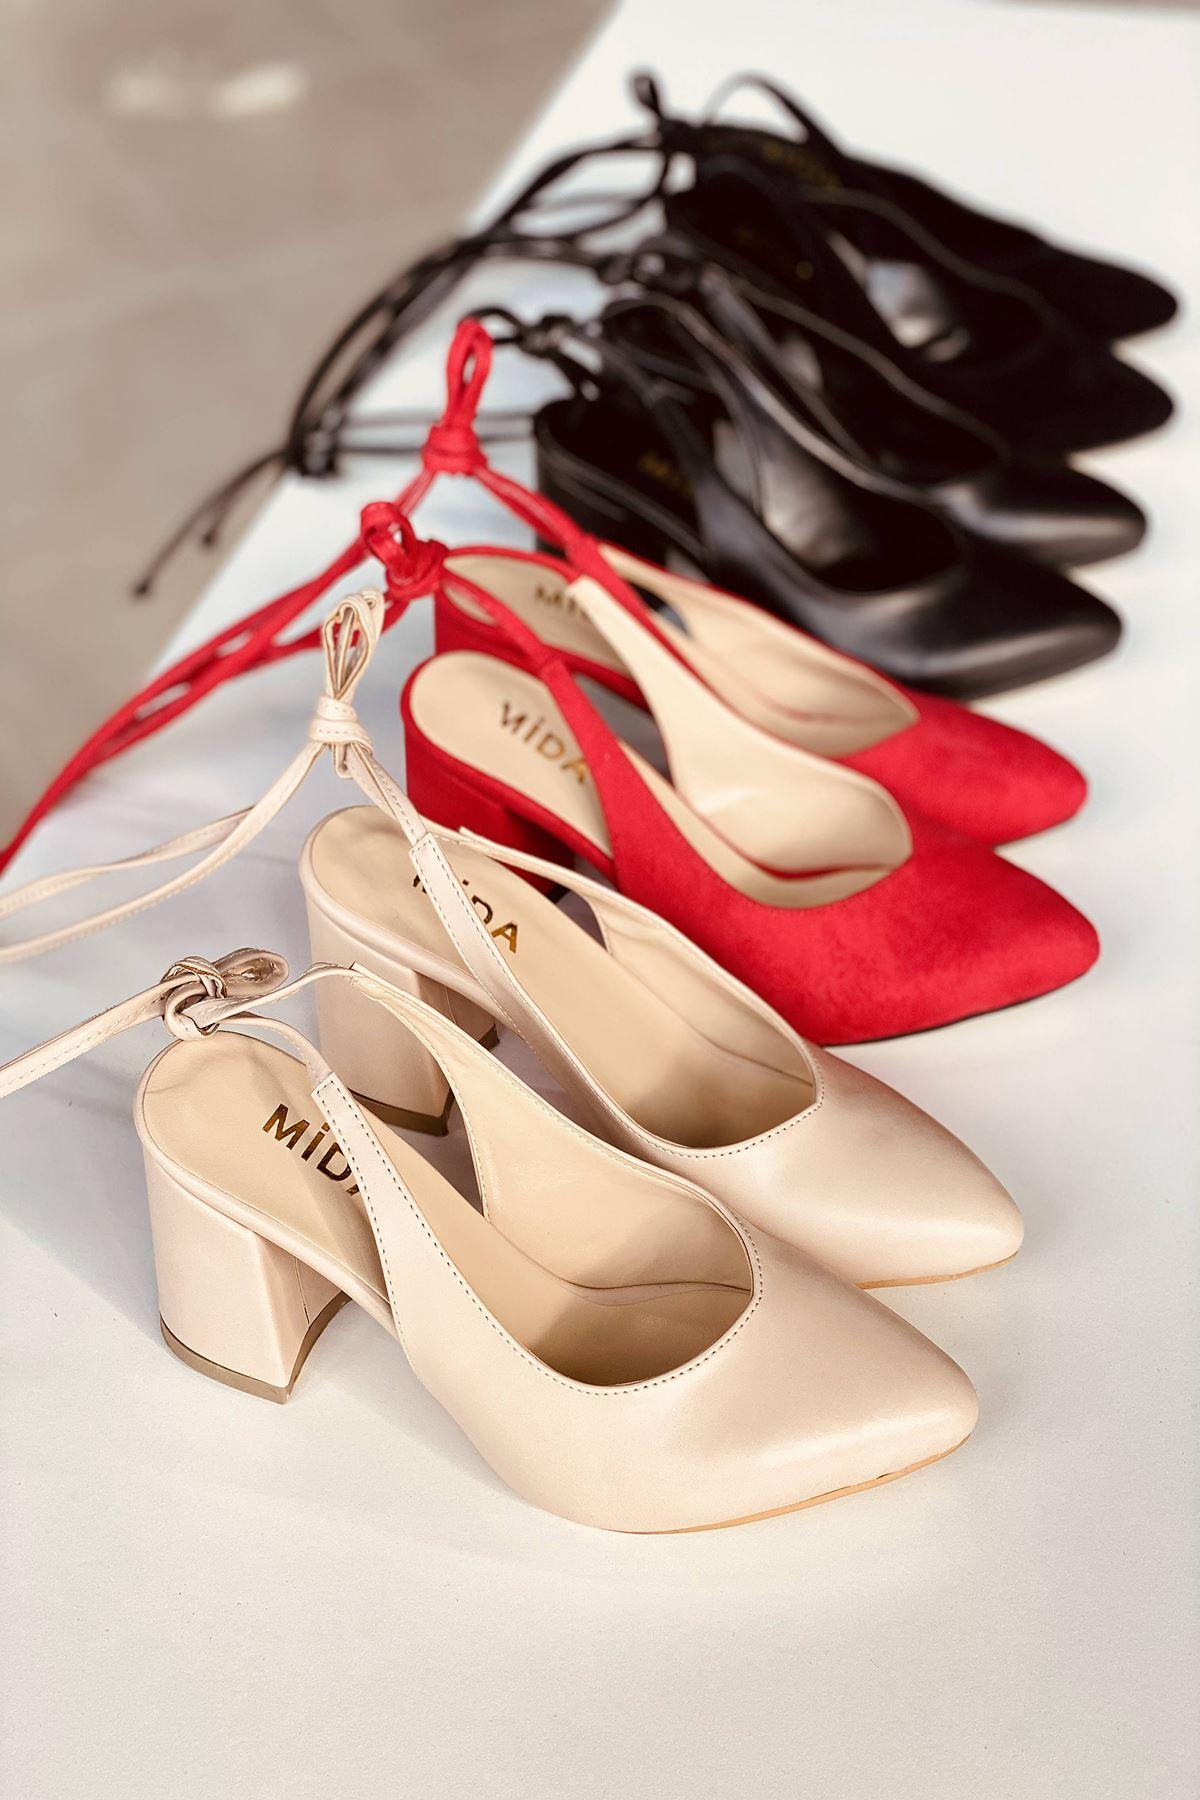 Y114 Ten Cilt Topuklu Ayakkabı